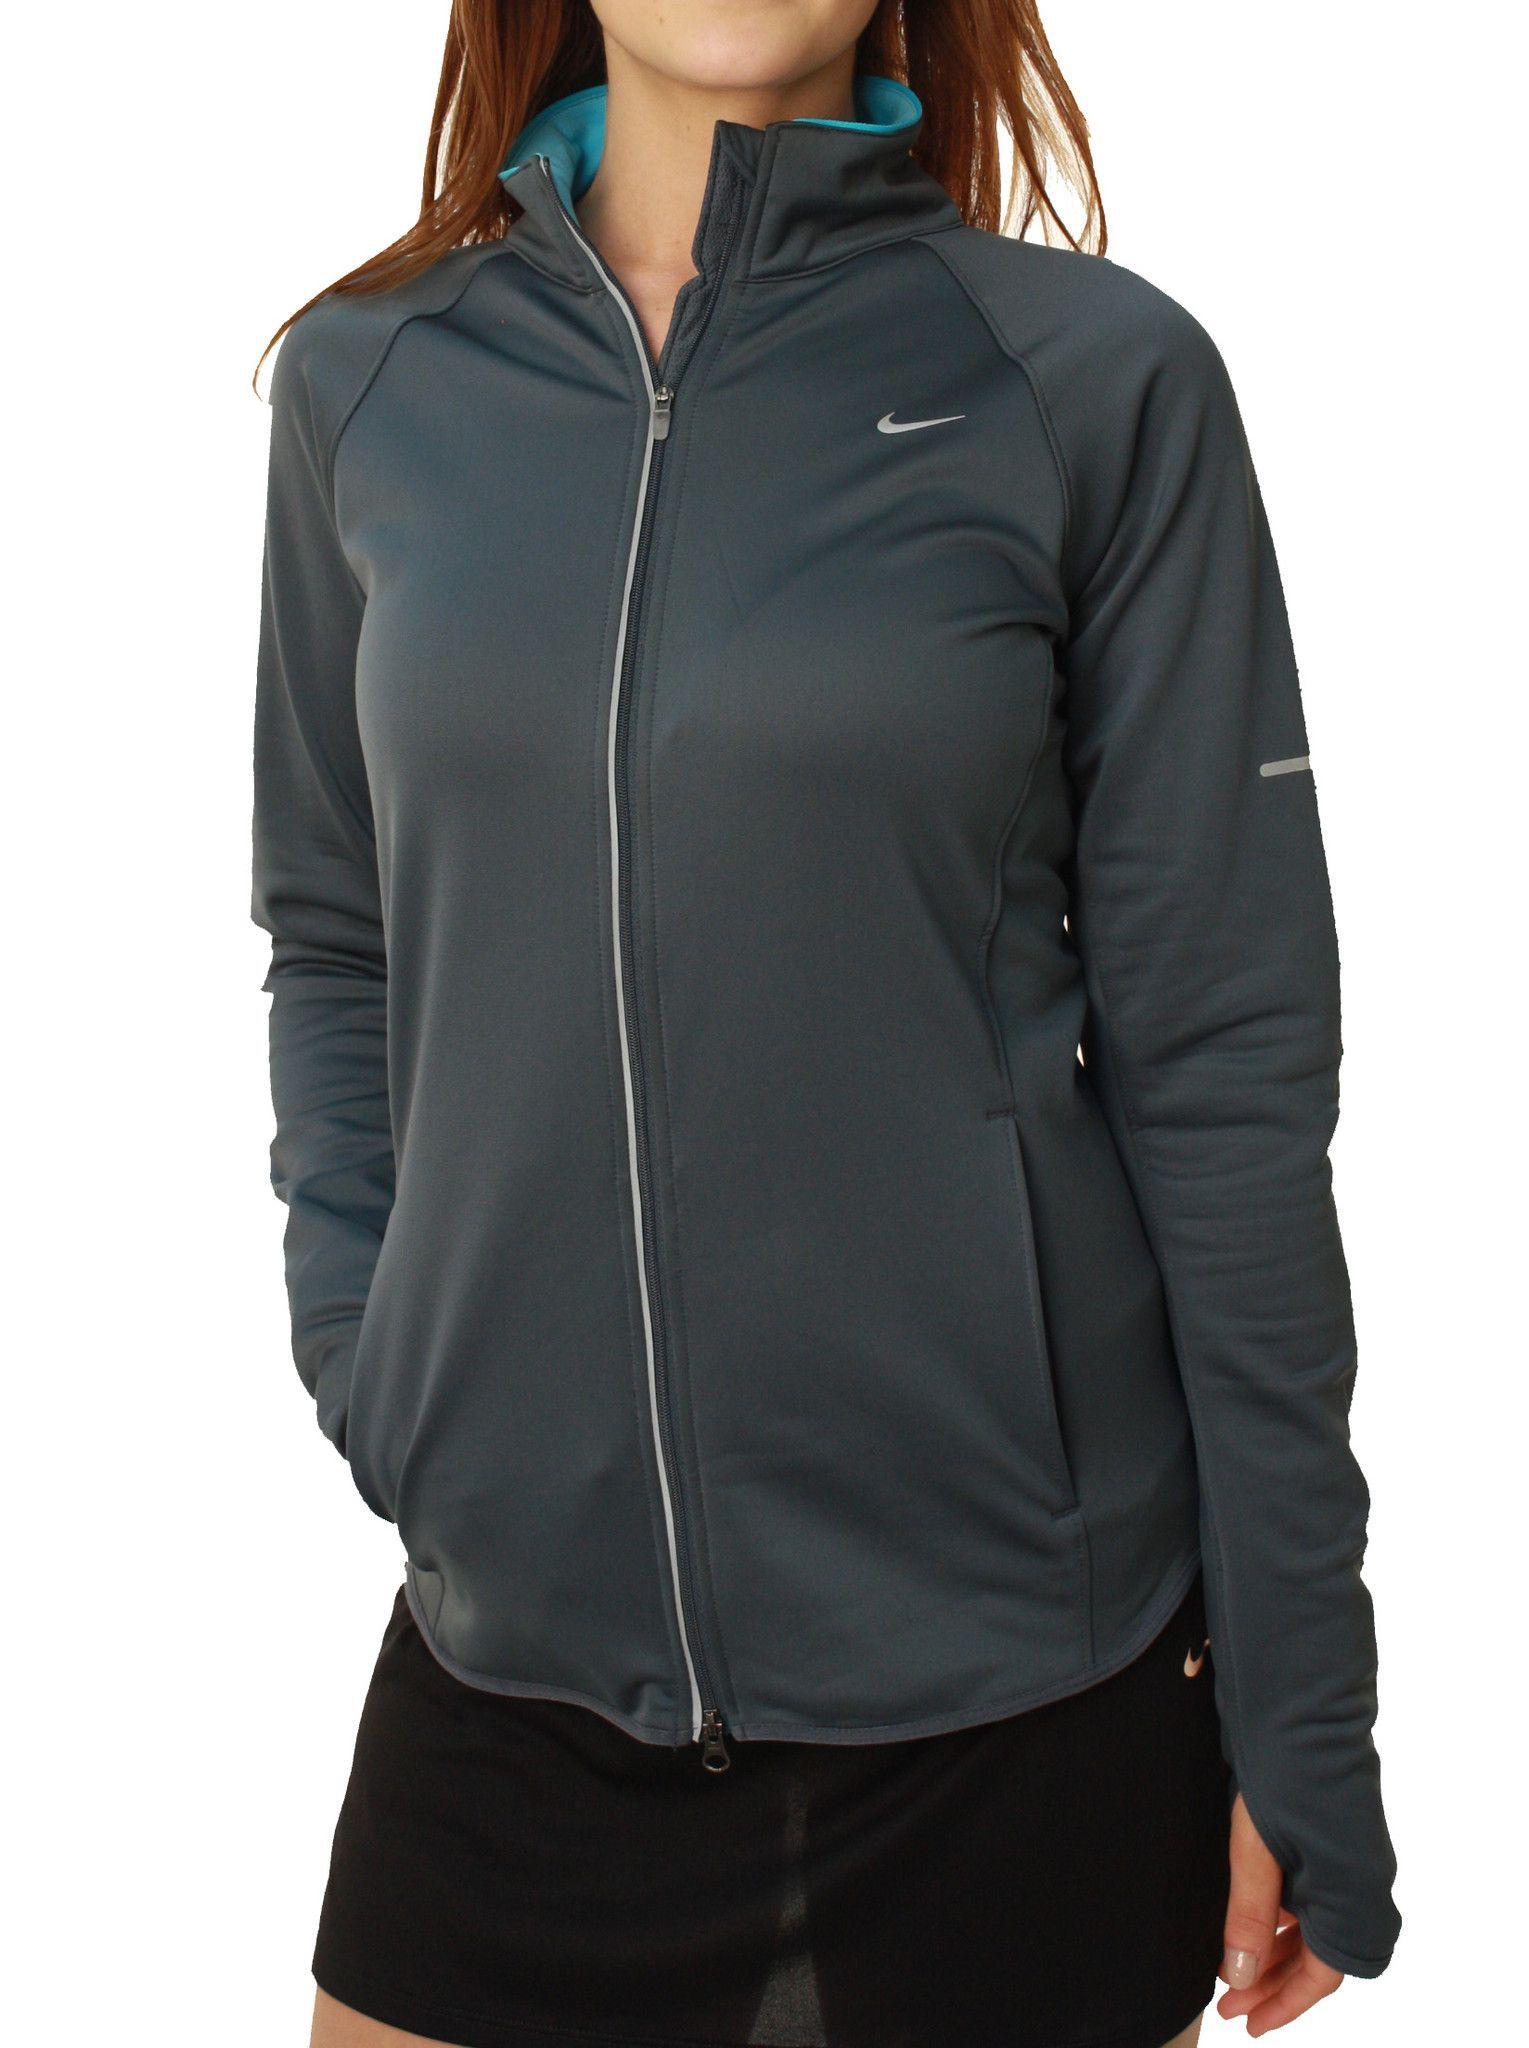 cba345ad8 Nike Women's Dri-Fit Element Thermal Full Zip Running Jacket | The ...